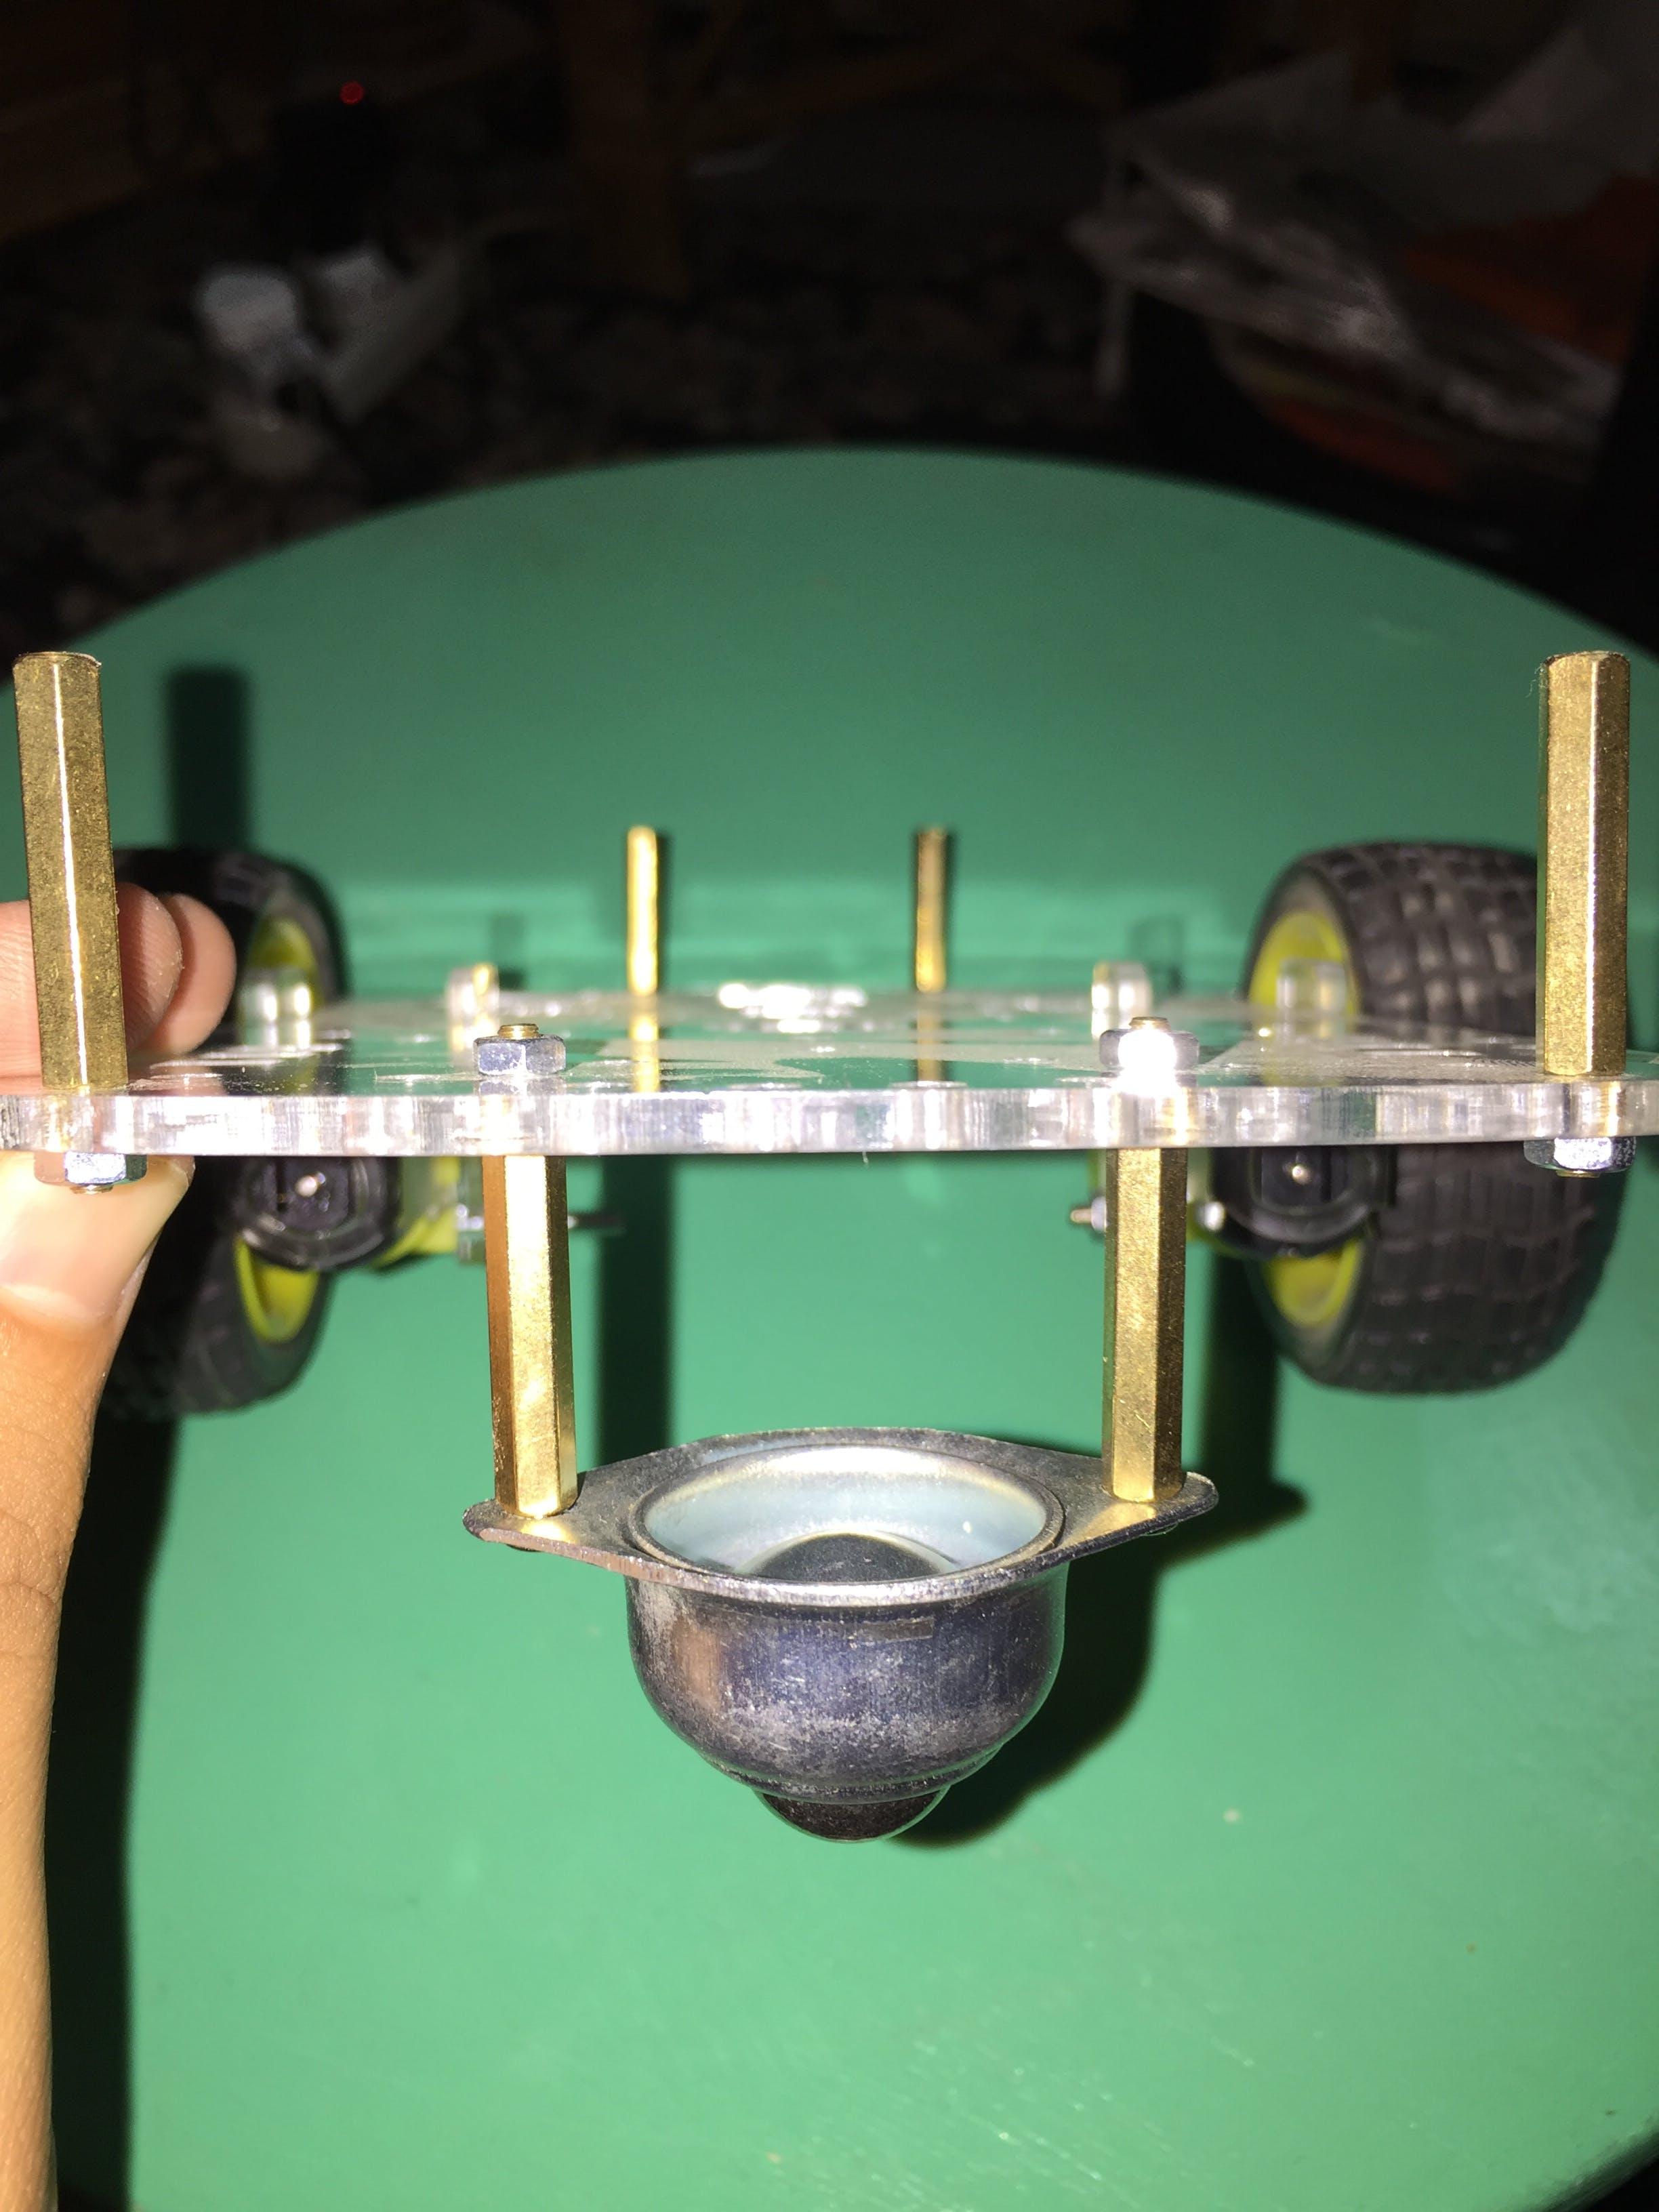 The Free Wheel